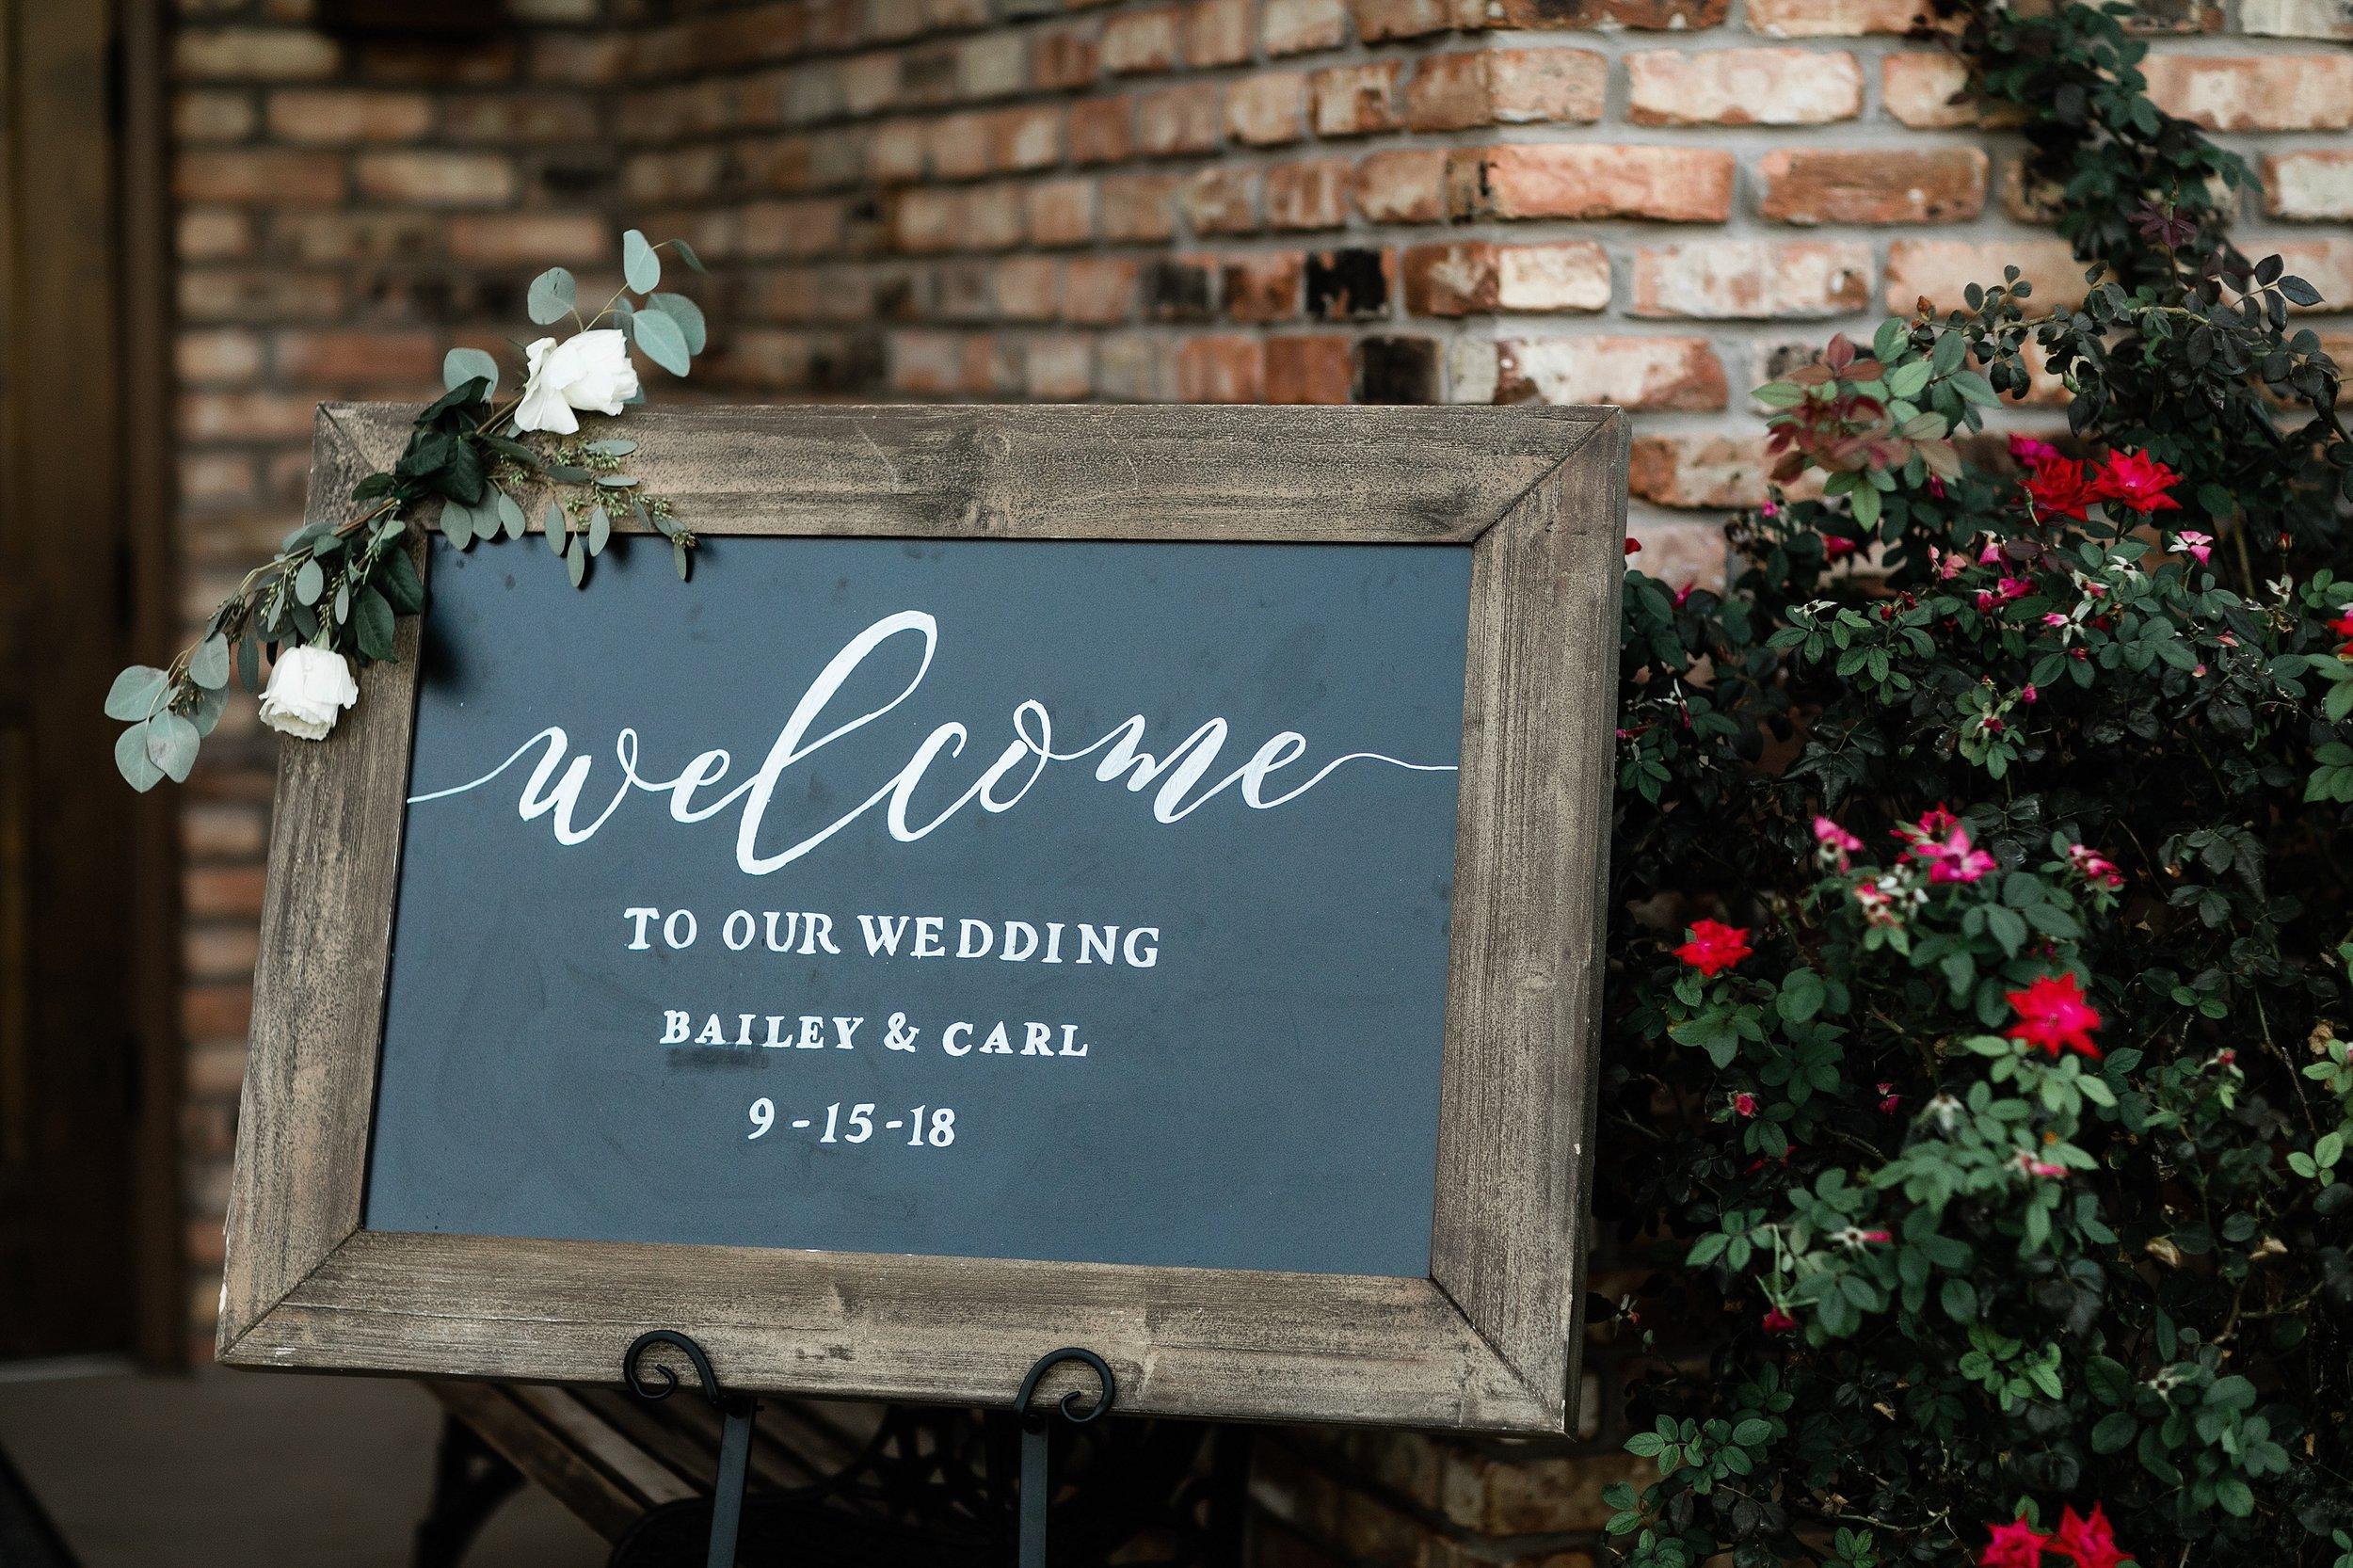 bailey-and-carl-coyote-ranch-resort-wedding-photographer-wichita-falls-texas-destination-wedding-0052.jpg